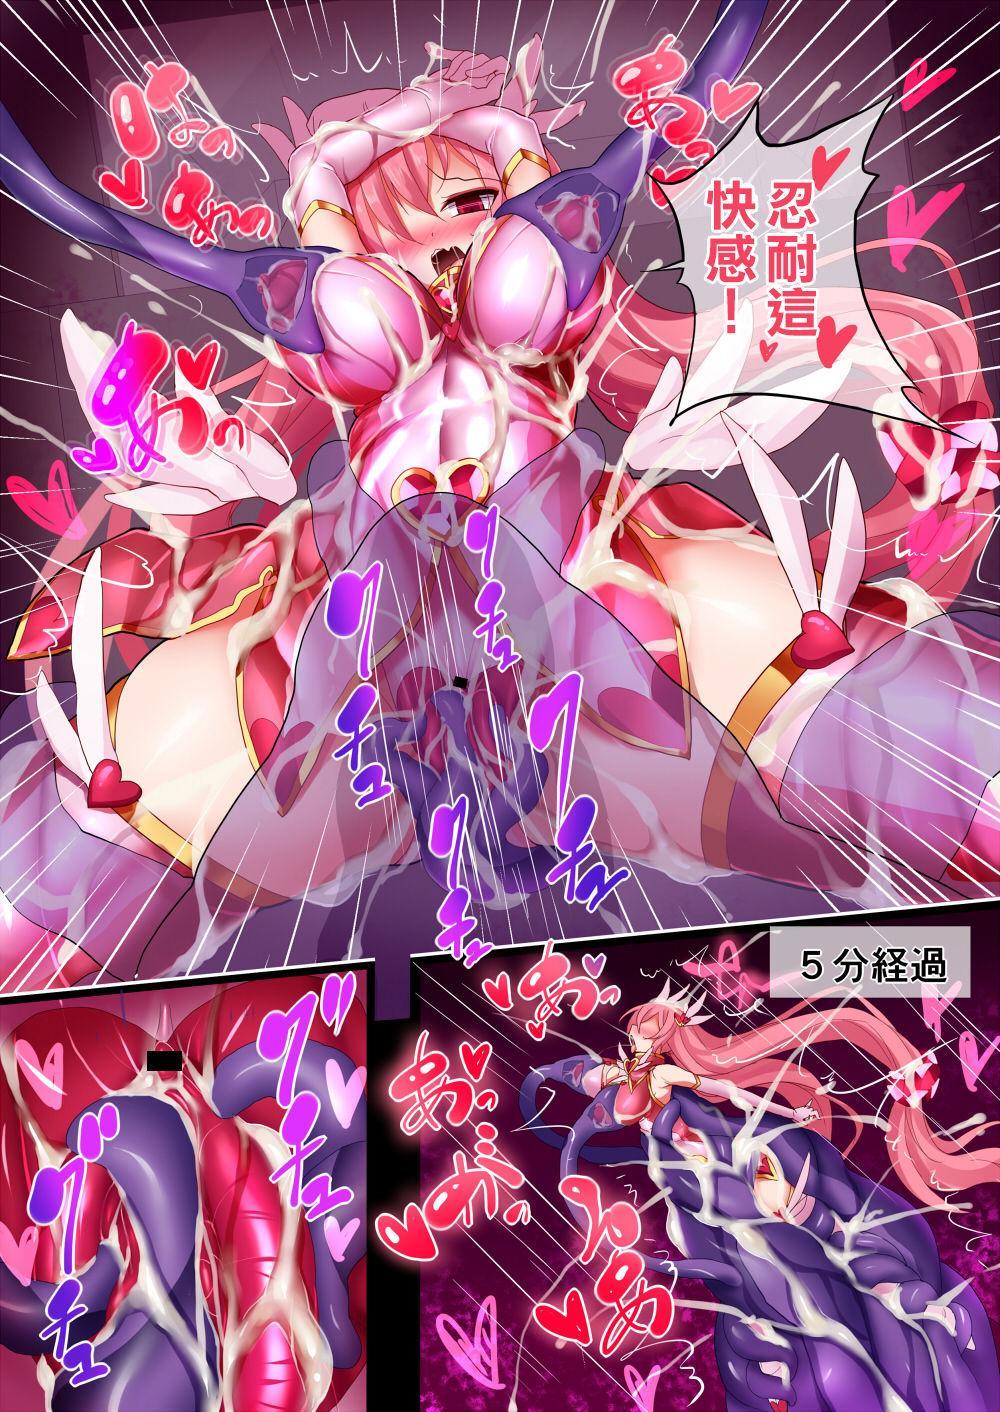 [Makutsutei (Nagai Wataru)] Orgasm Unit EX -Mahou Senshi Akari Ch. 1-5 [Chinese] [这很恶堕 x Lolipoi汉化组] 16